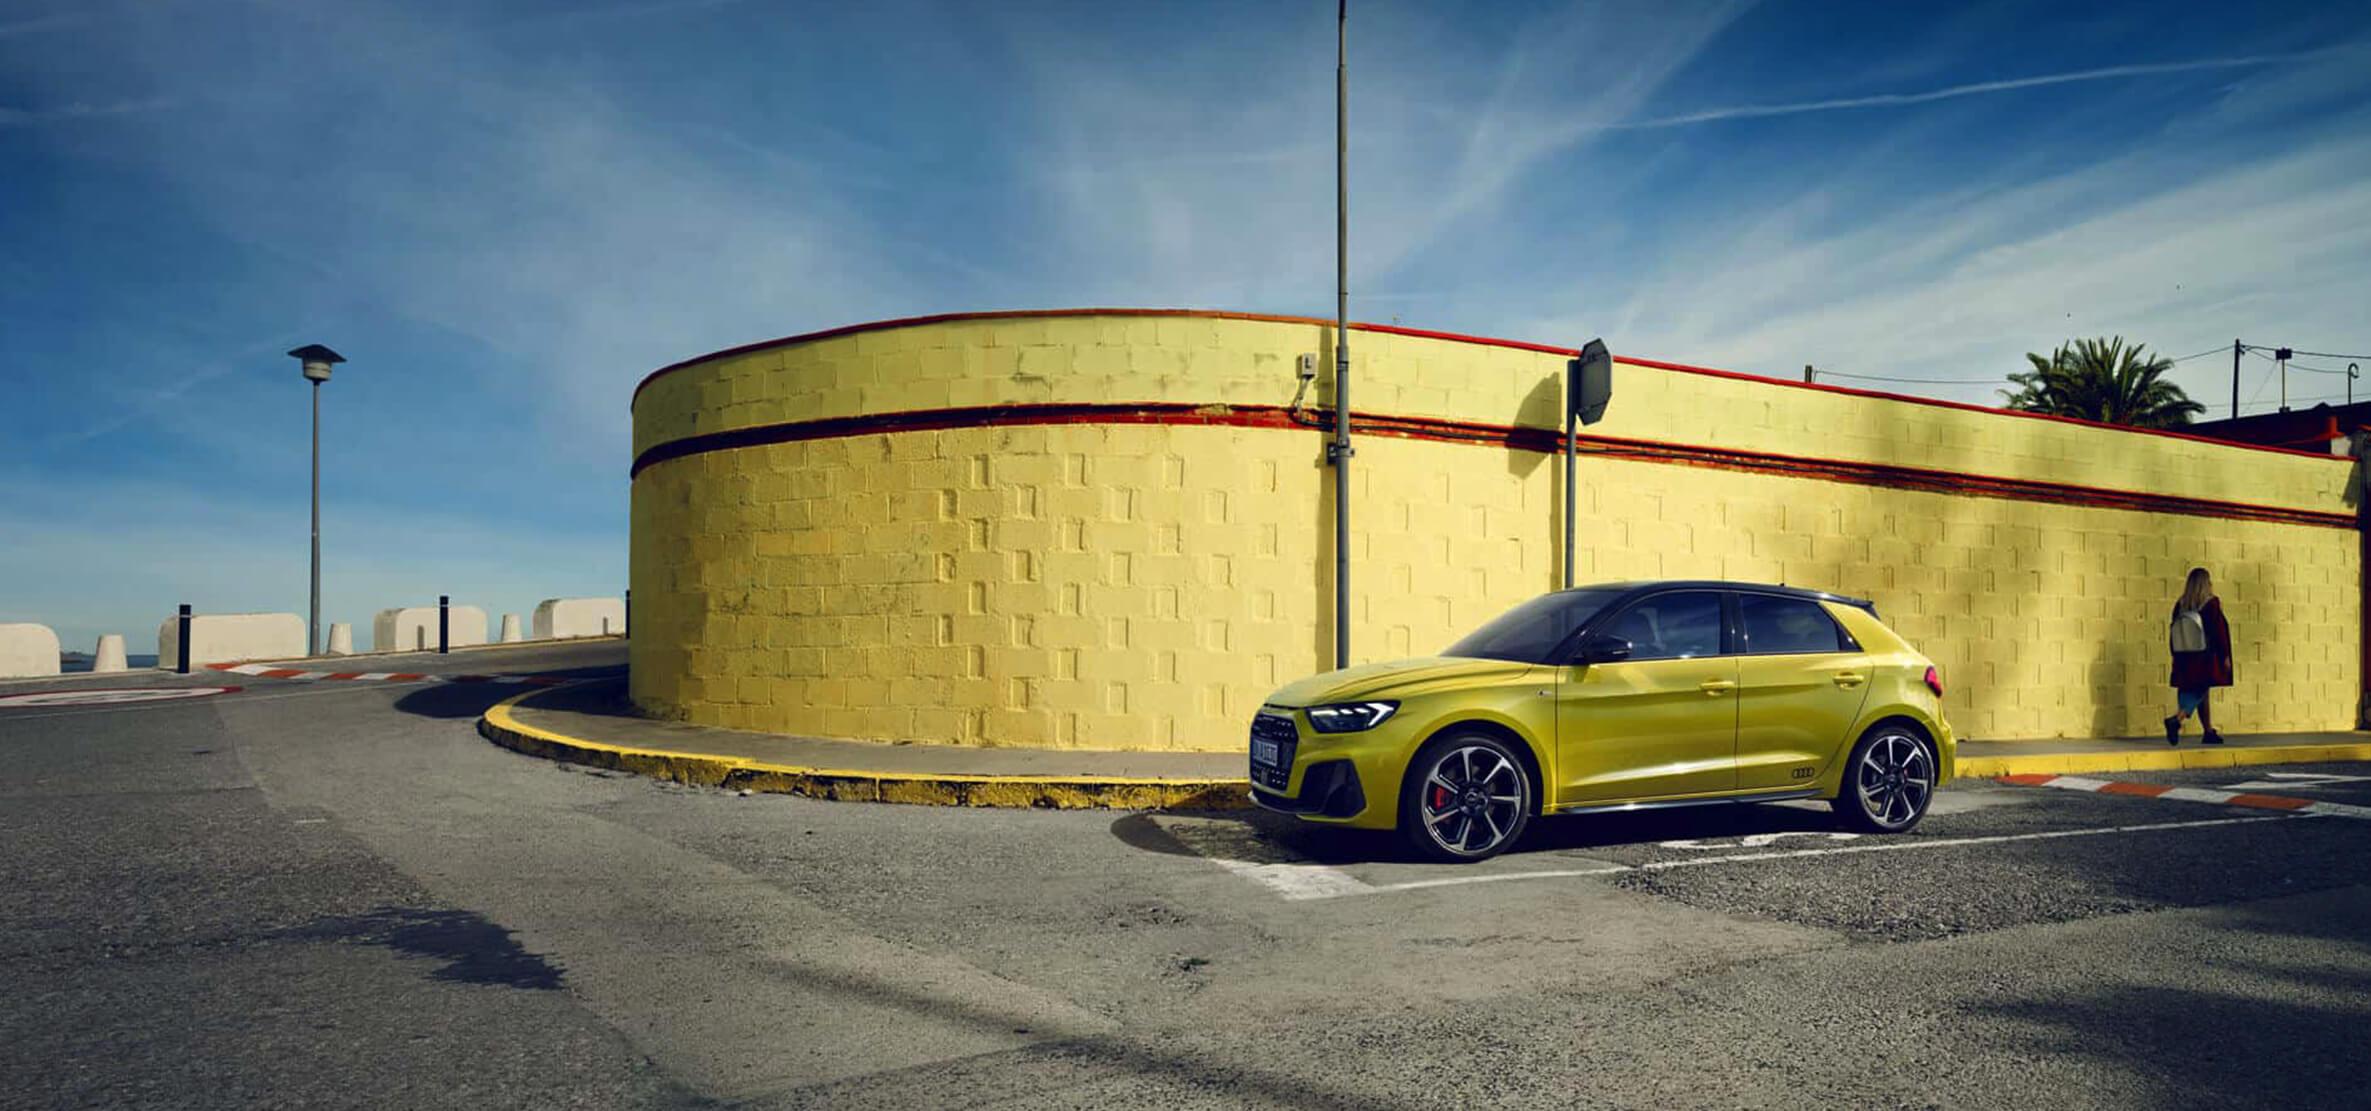 The New Audi A1 - Striking, spacious, sporty.